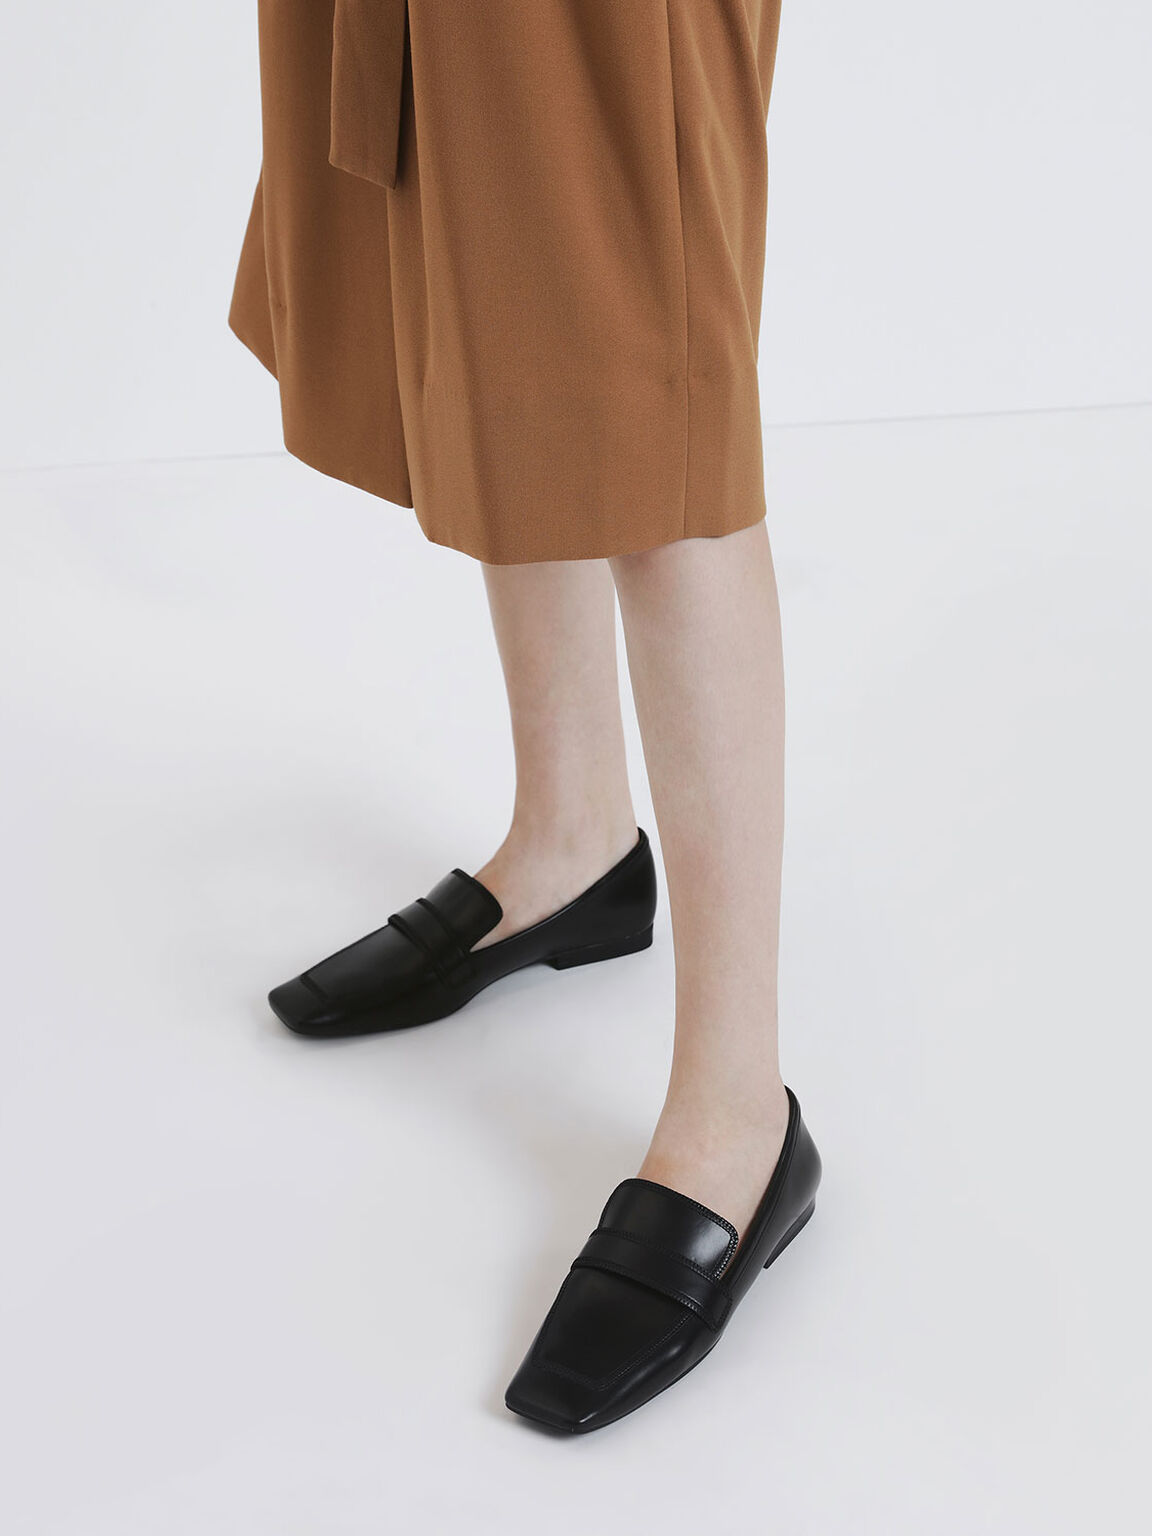 Overlock Stitch Loafers, Black, hi-res